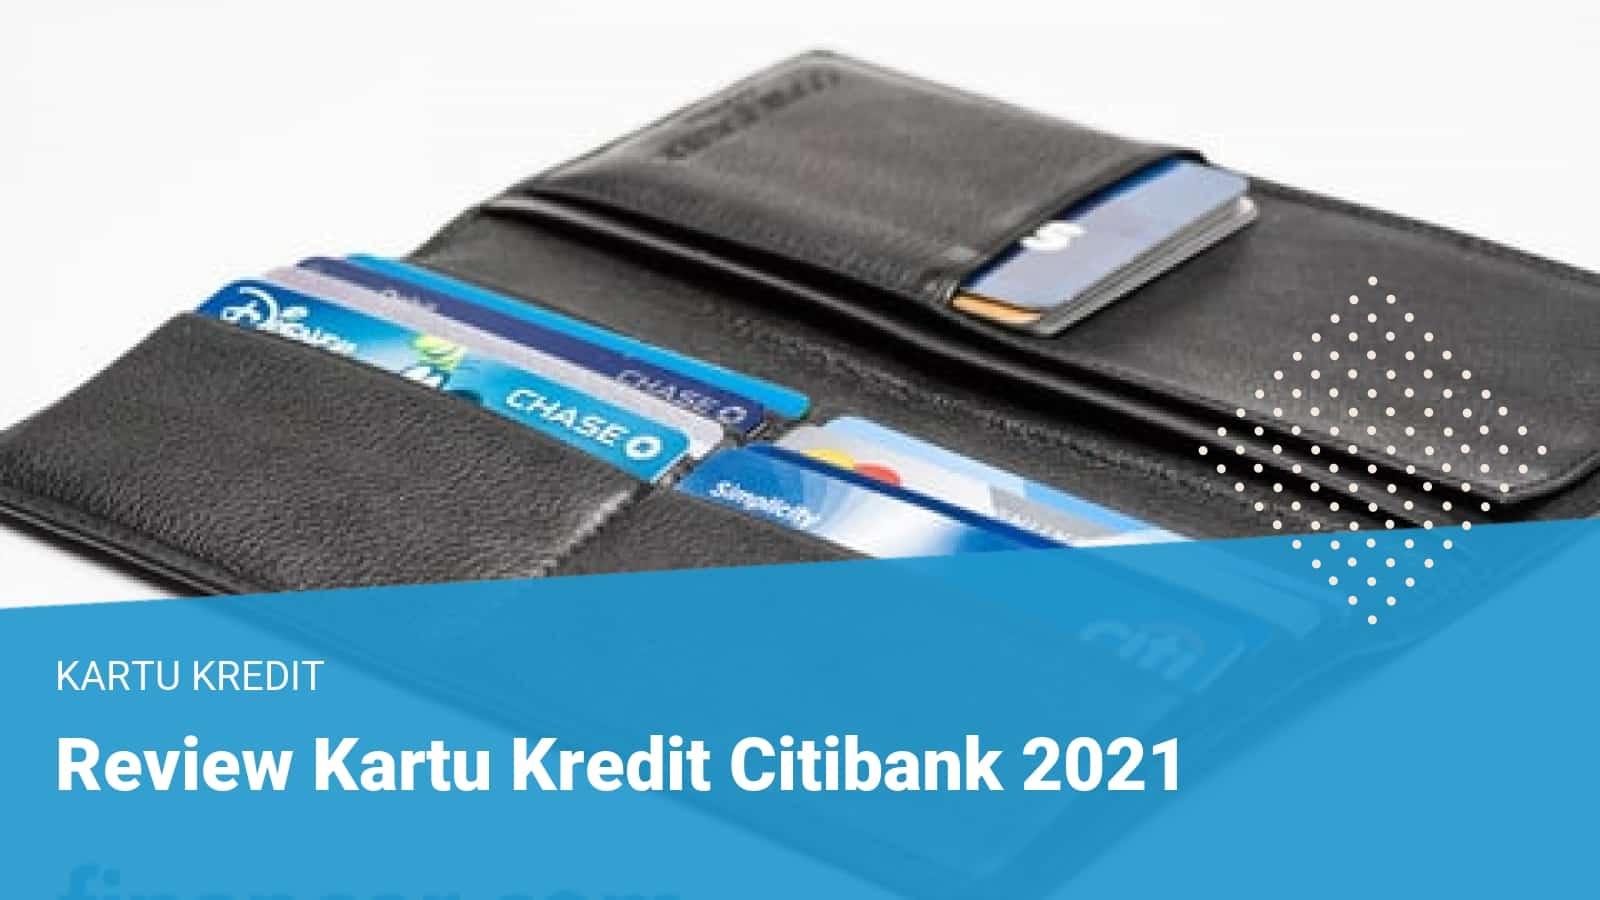 Kartu Kredit Citibank Indonesia - Financer.com